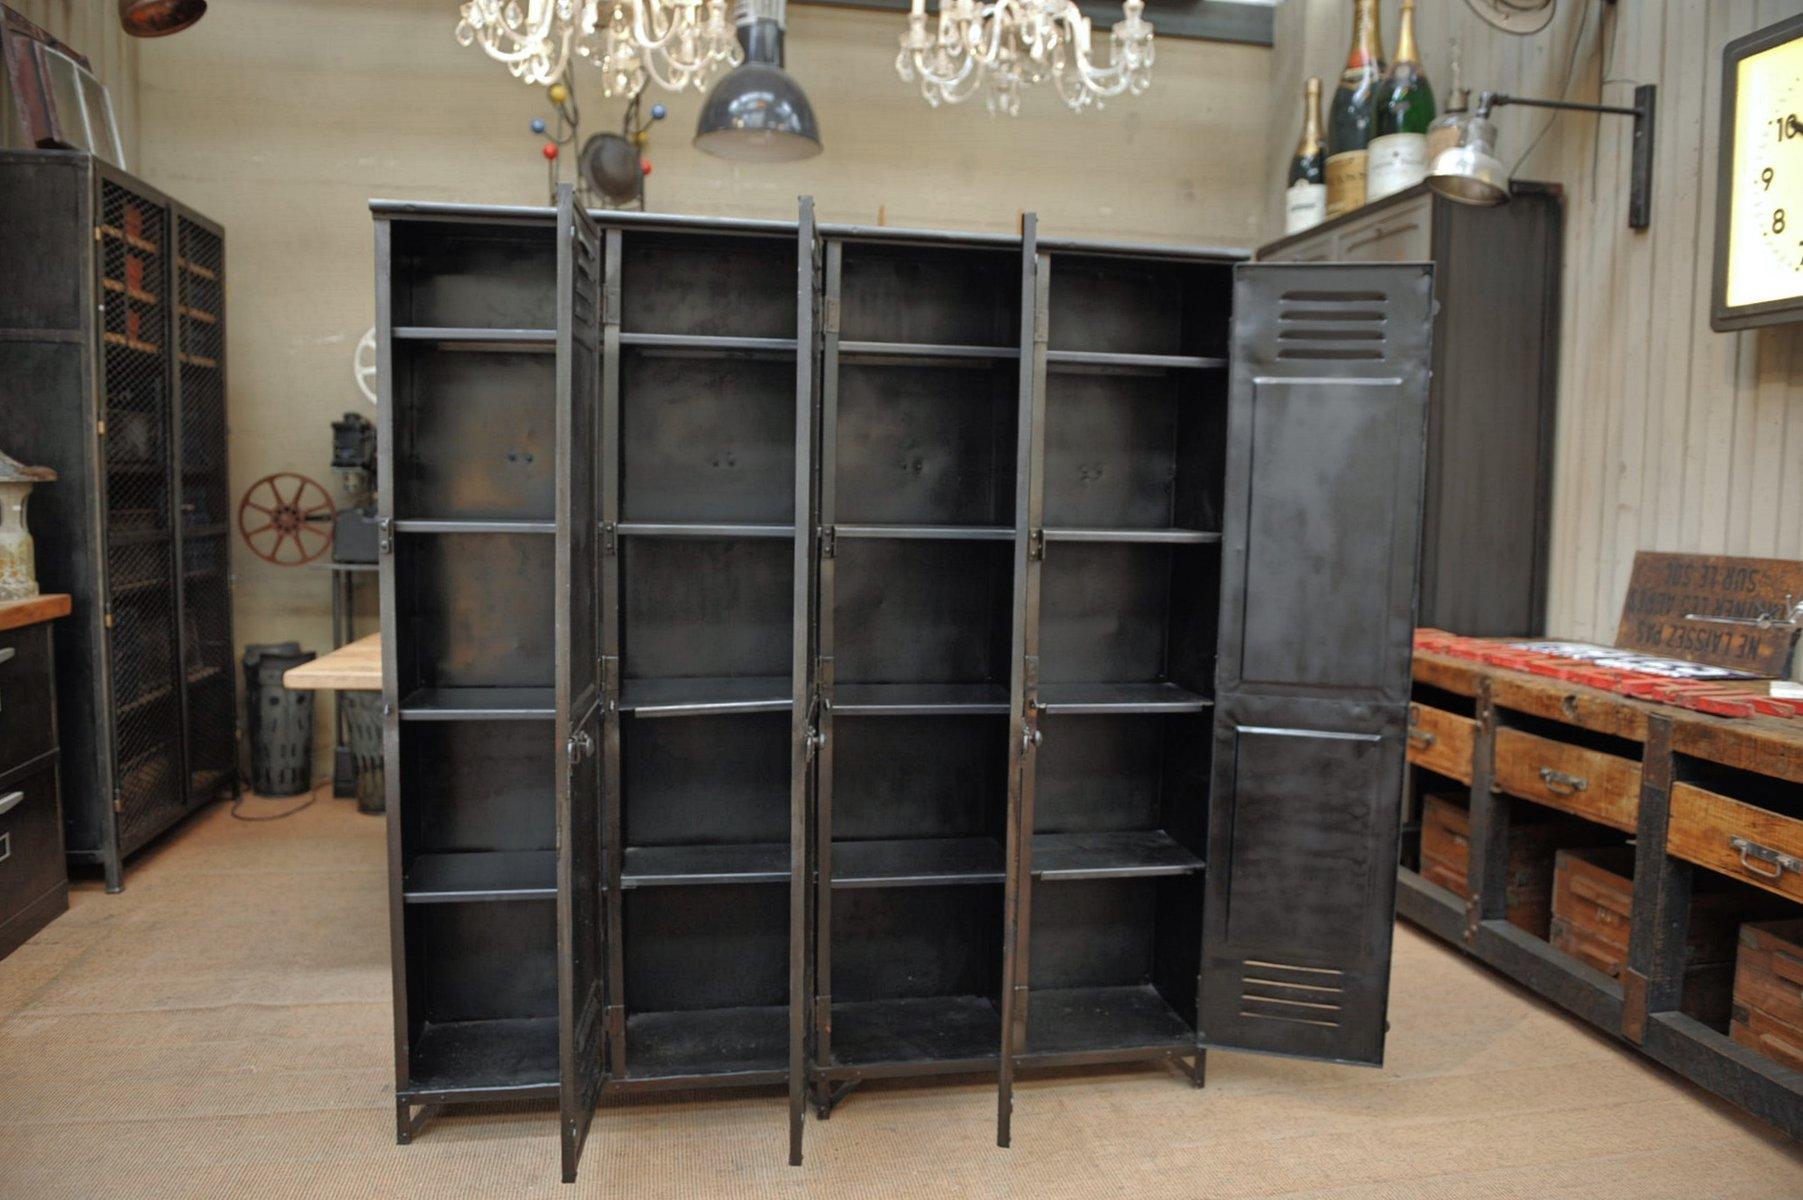 vintage metall spind reihe 1930er bei pamono kaufen. Black Bedroom Furniture Sets. Home Design Ideas